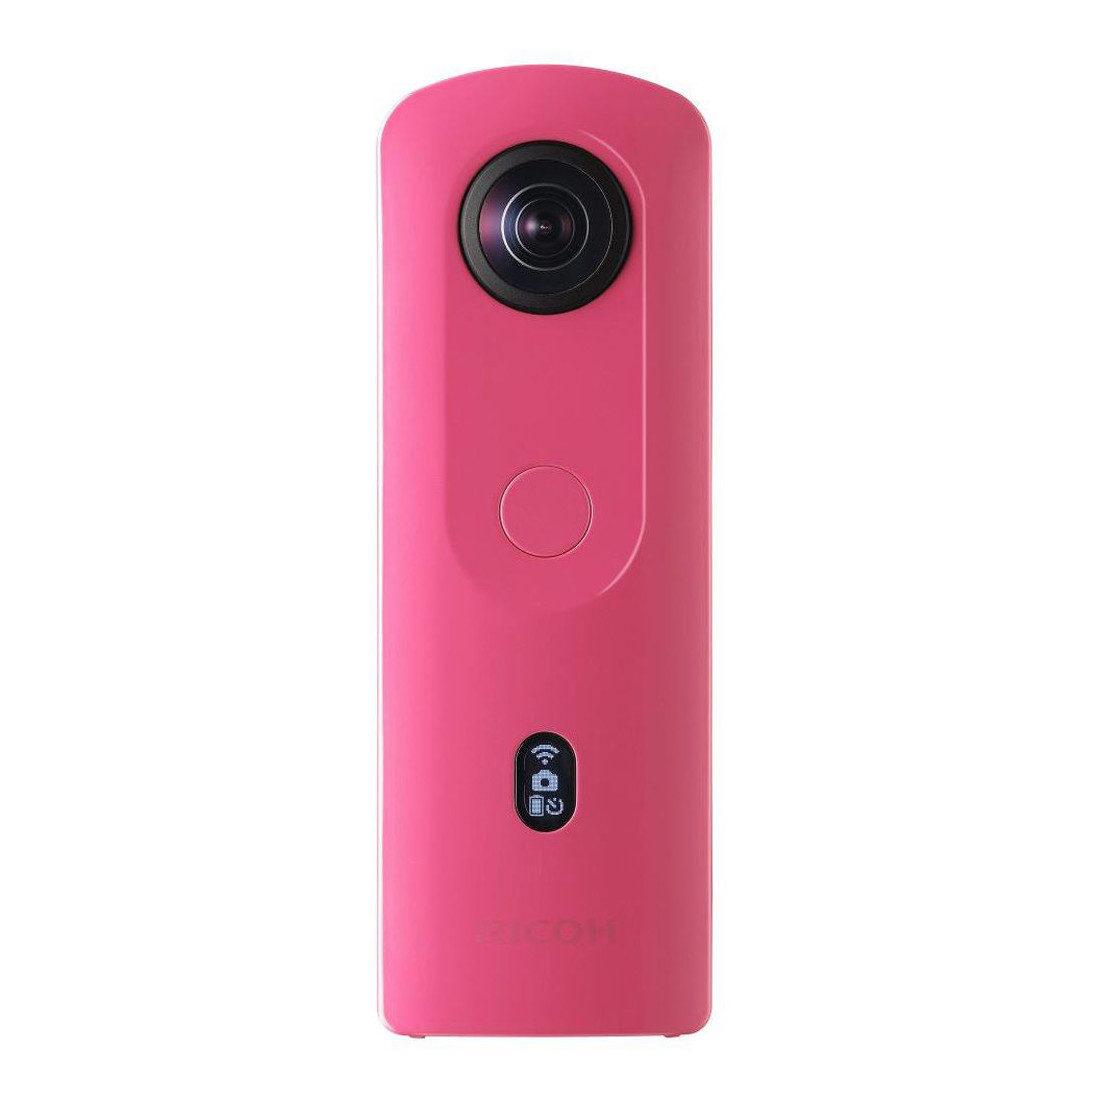 Ricoh Theta SC2 360-graden camera Roze <br/>€ 269.00 <br/> <a href='https://www.cameranu.nl/fotografie/?tt=12190_474631_241358_&r=https%3A%2F%2Fwww.cameranu.nl%2Fnl%2Fp3141832%2Fricoh-theta-sc2-360-graden-camera-roze%3Fchannable%3De10841.MzE0MTgzMg%26utm_campaign%3D%26utm_content%3D360%25C2%25B0%2BTheta%2Bcamera%26utm_source%3DTradetracker%26utm_medium%3Dcpc%26utm_term%3DDigitale%2Bcamera%26apos%3Bs' target='_blank'>naar de winkel</a>